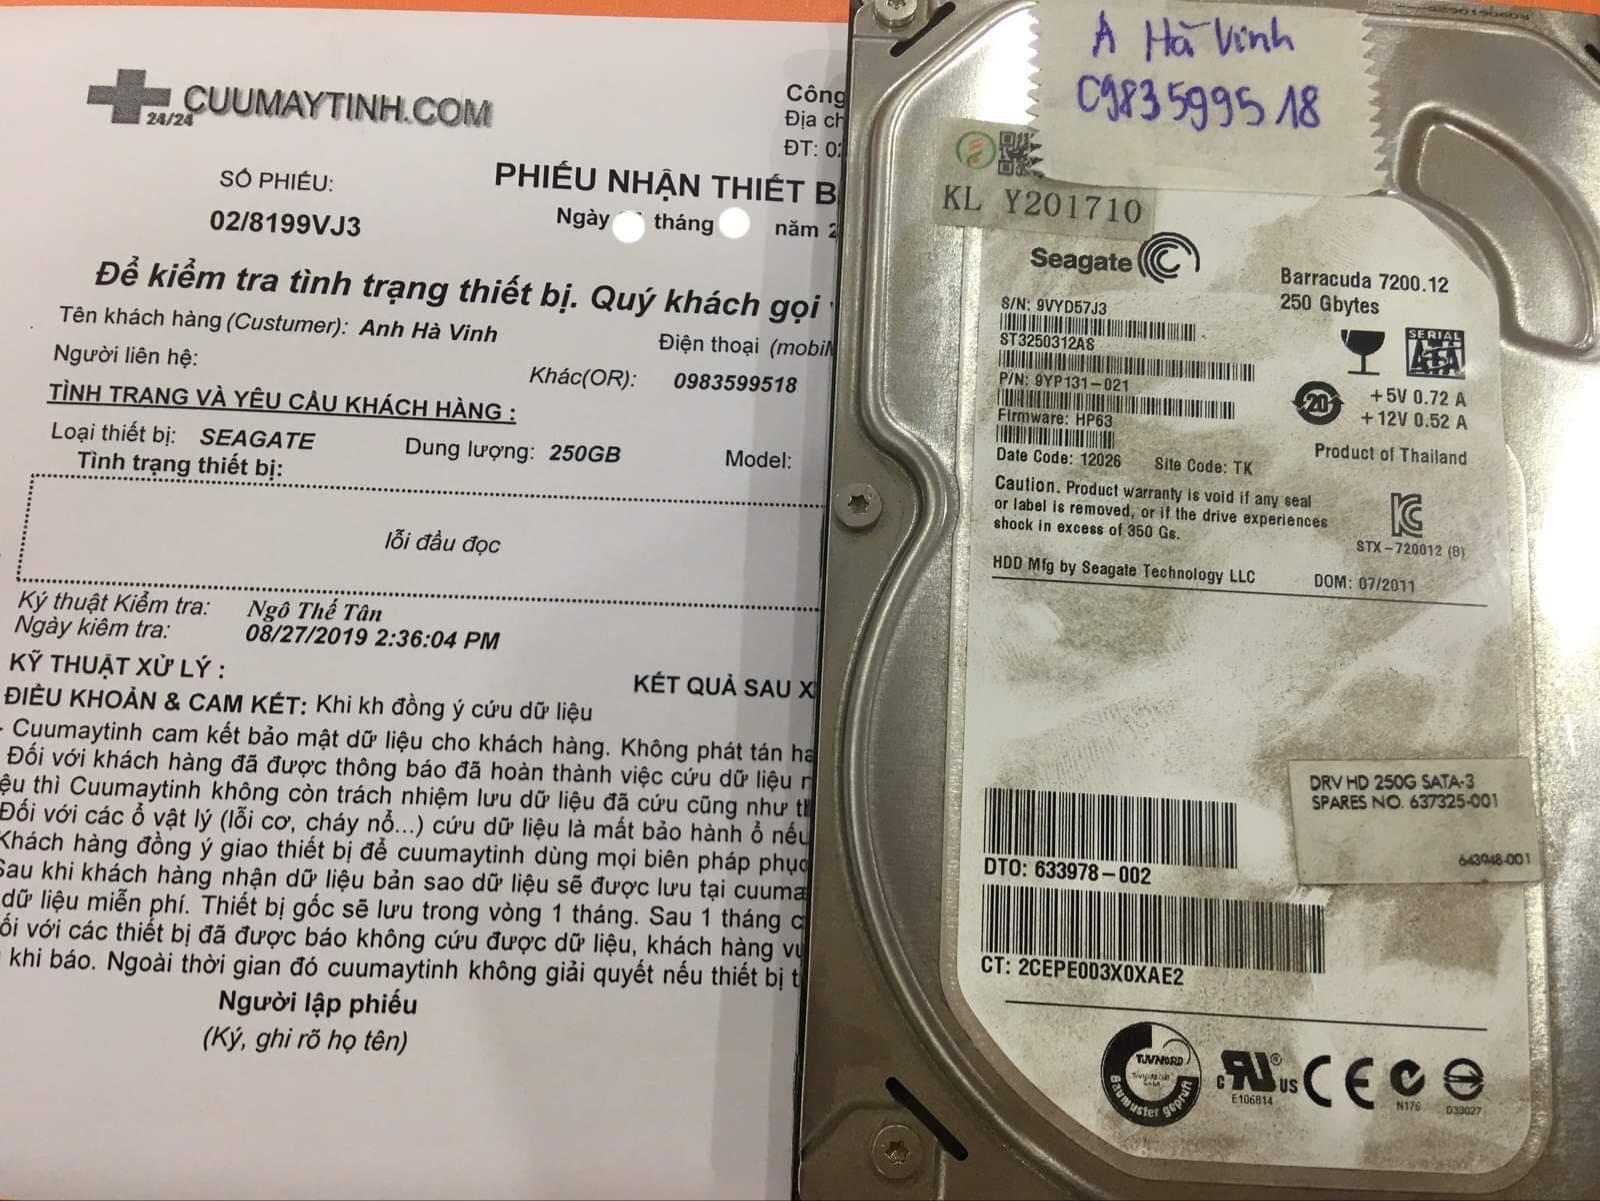 Cứu dữ liệu ổ cứng Seagate 250GB lỗi đầu đọc 04/09/2019 - cuumaytinh